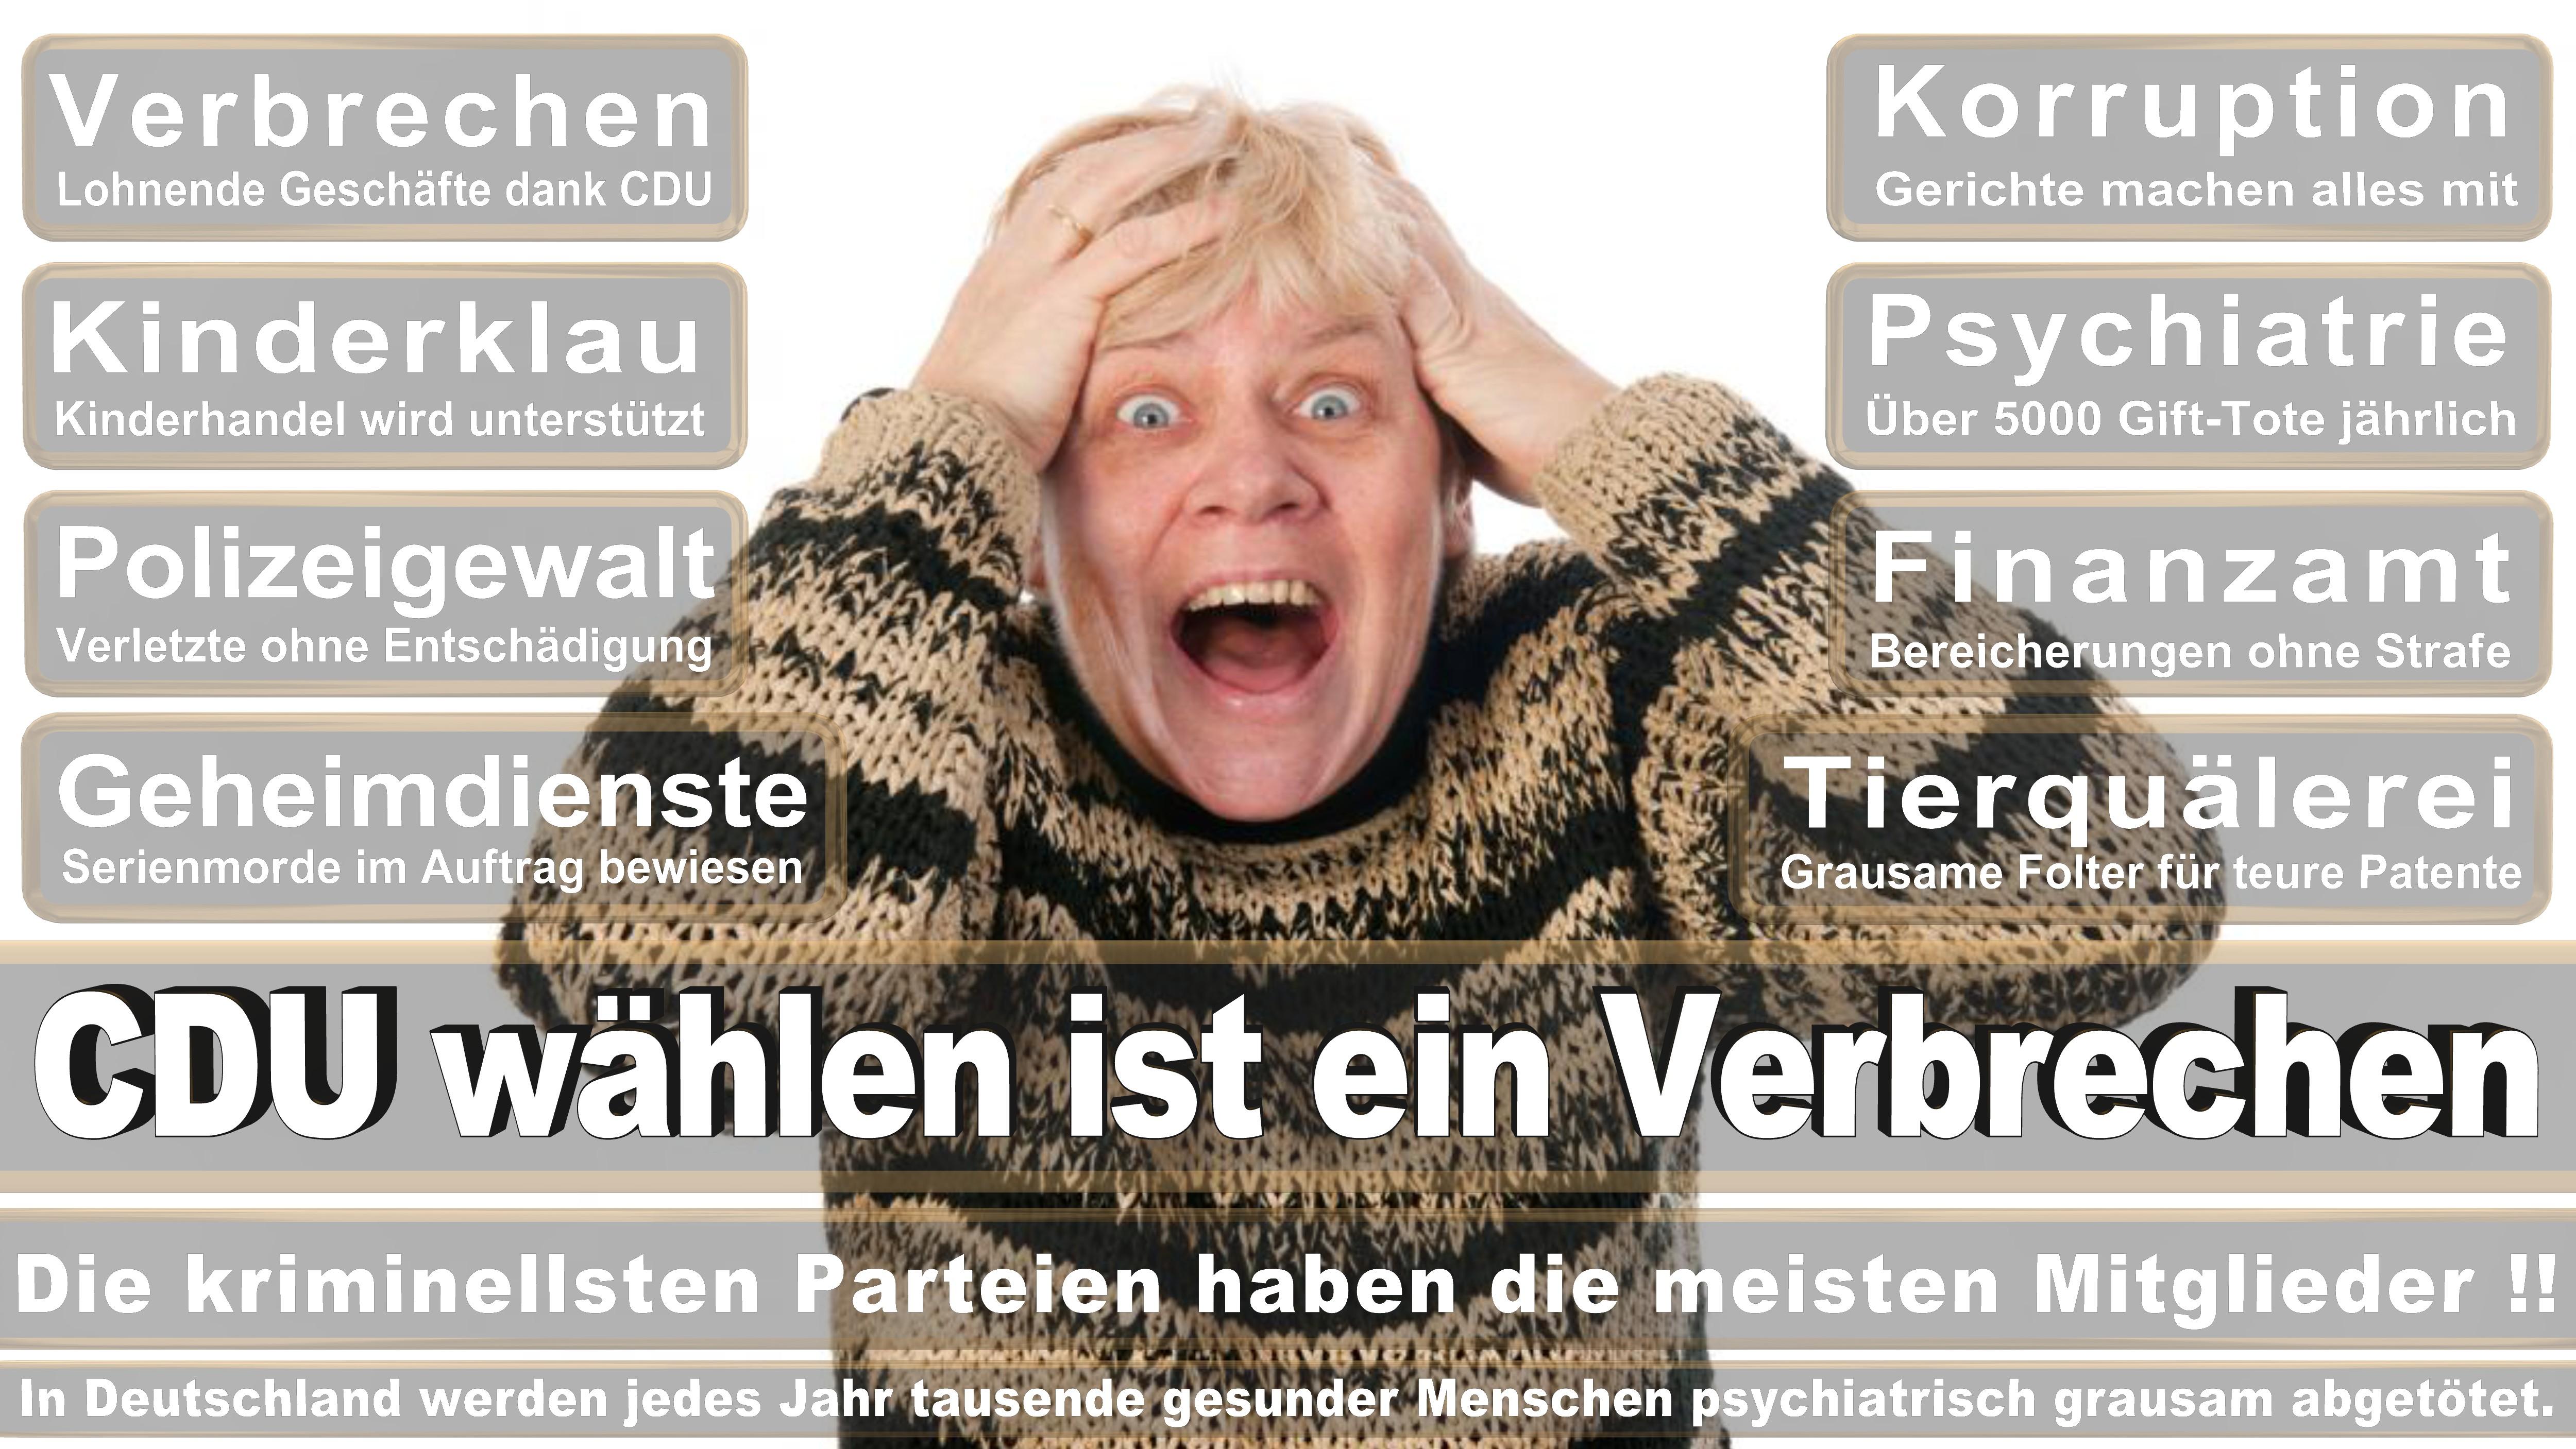 Reinhold Sendker CDU CSU Politiker